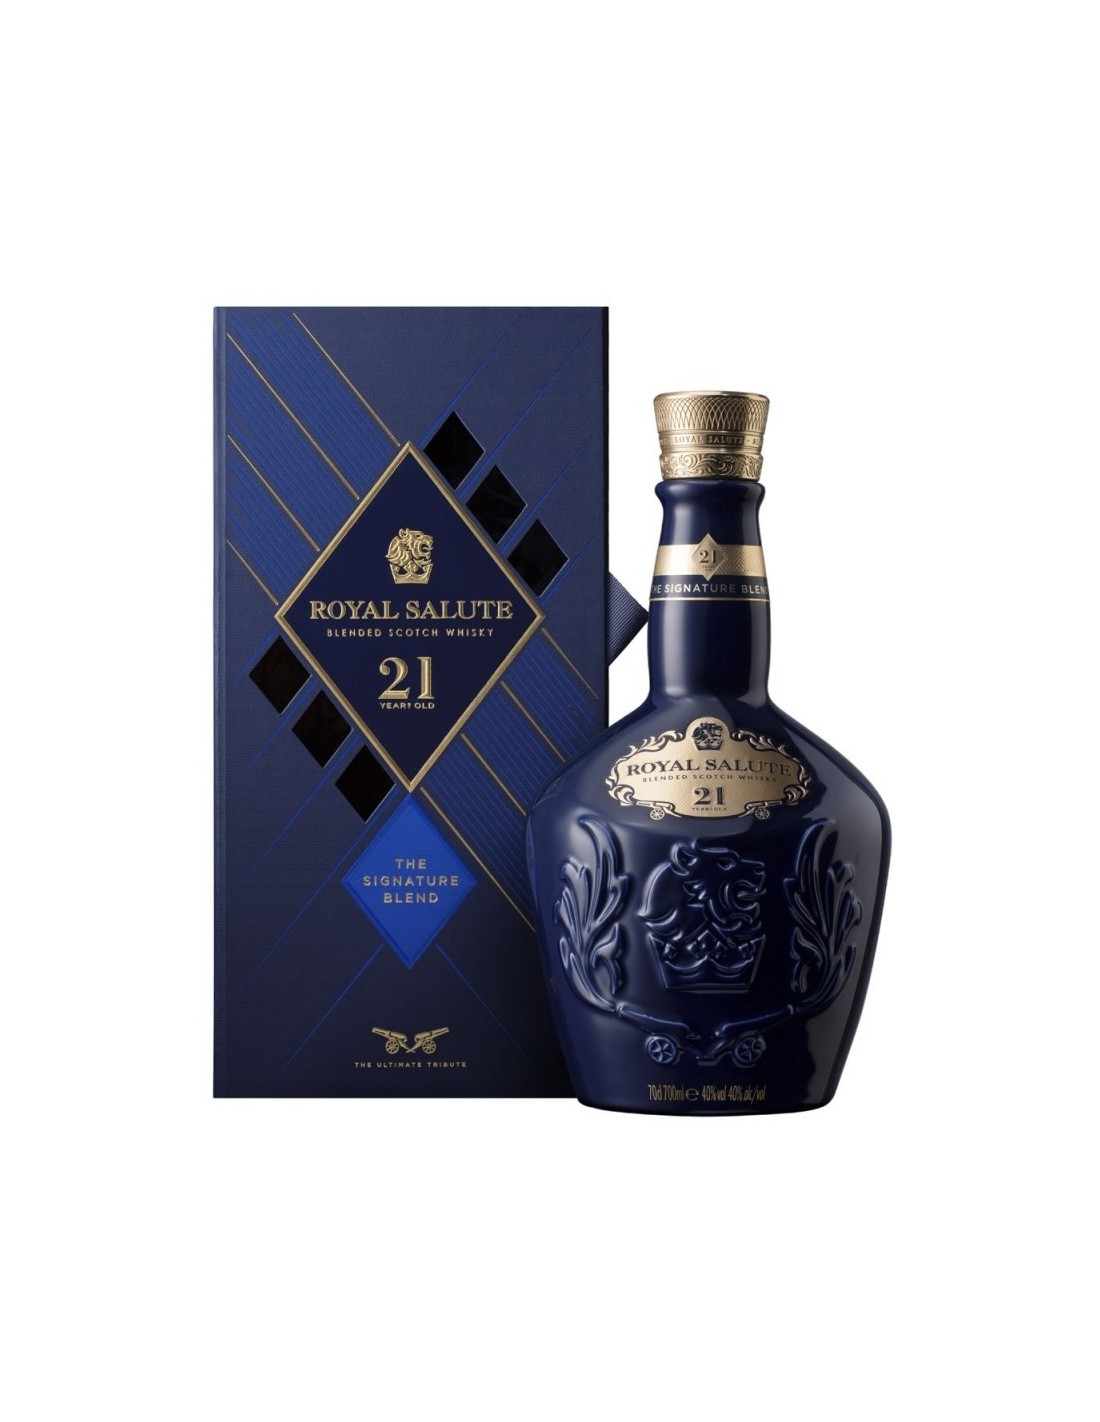 Whisky Chivas Regal Royal Salute 21 ani, 40% alc., 0.7L, Scotia